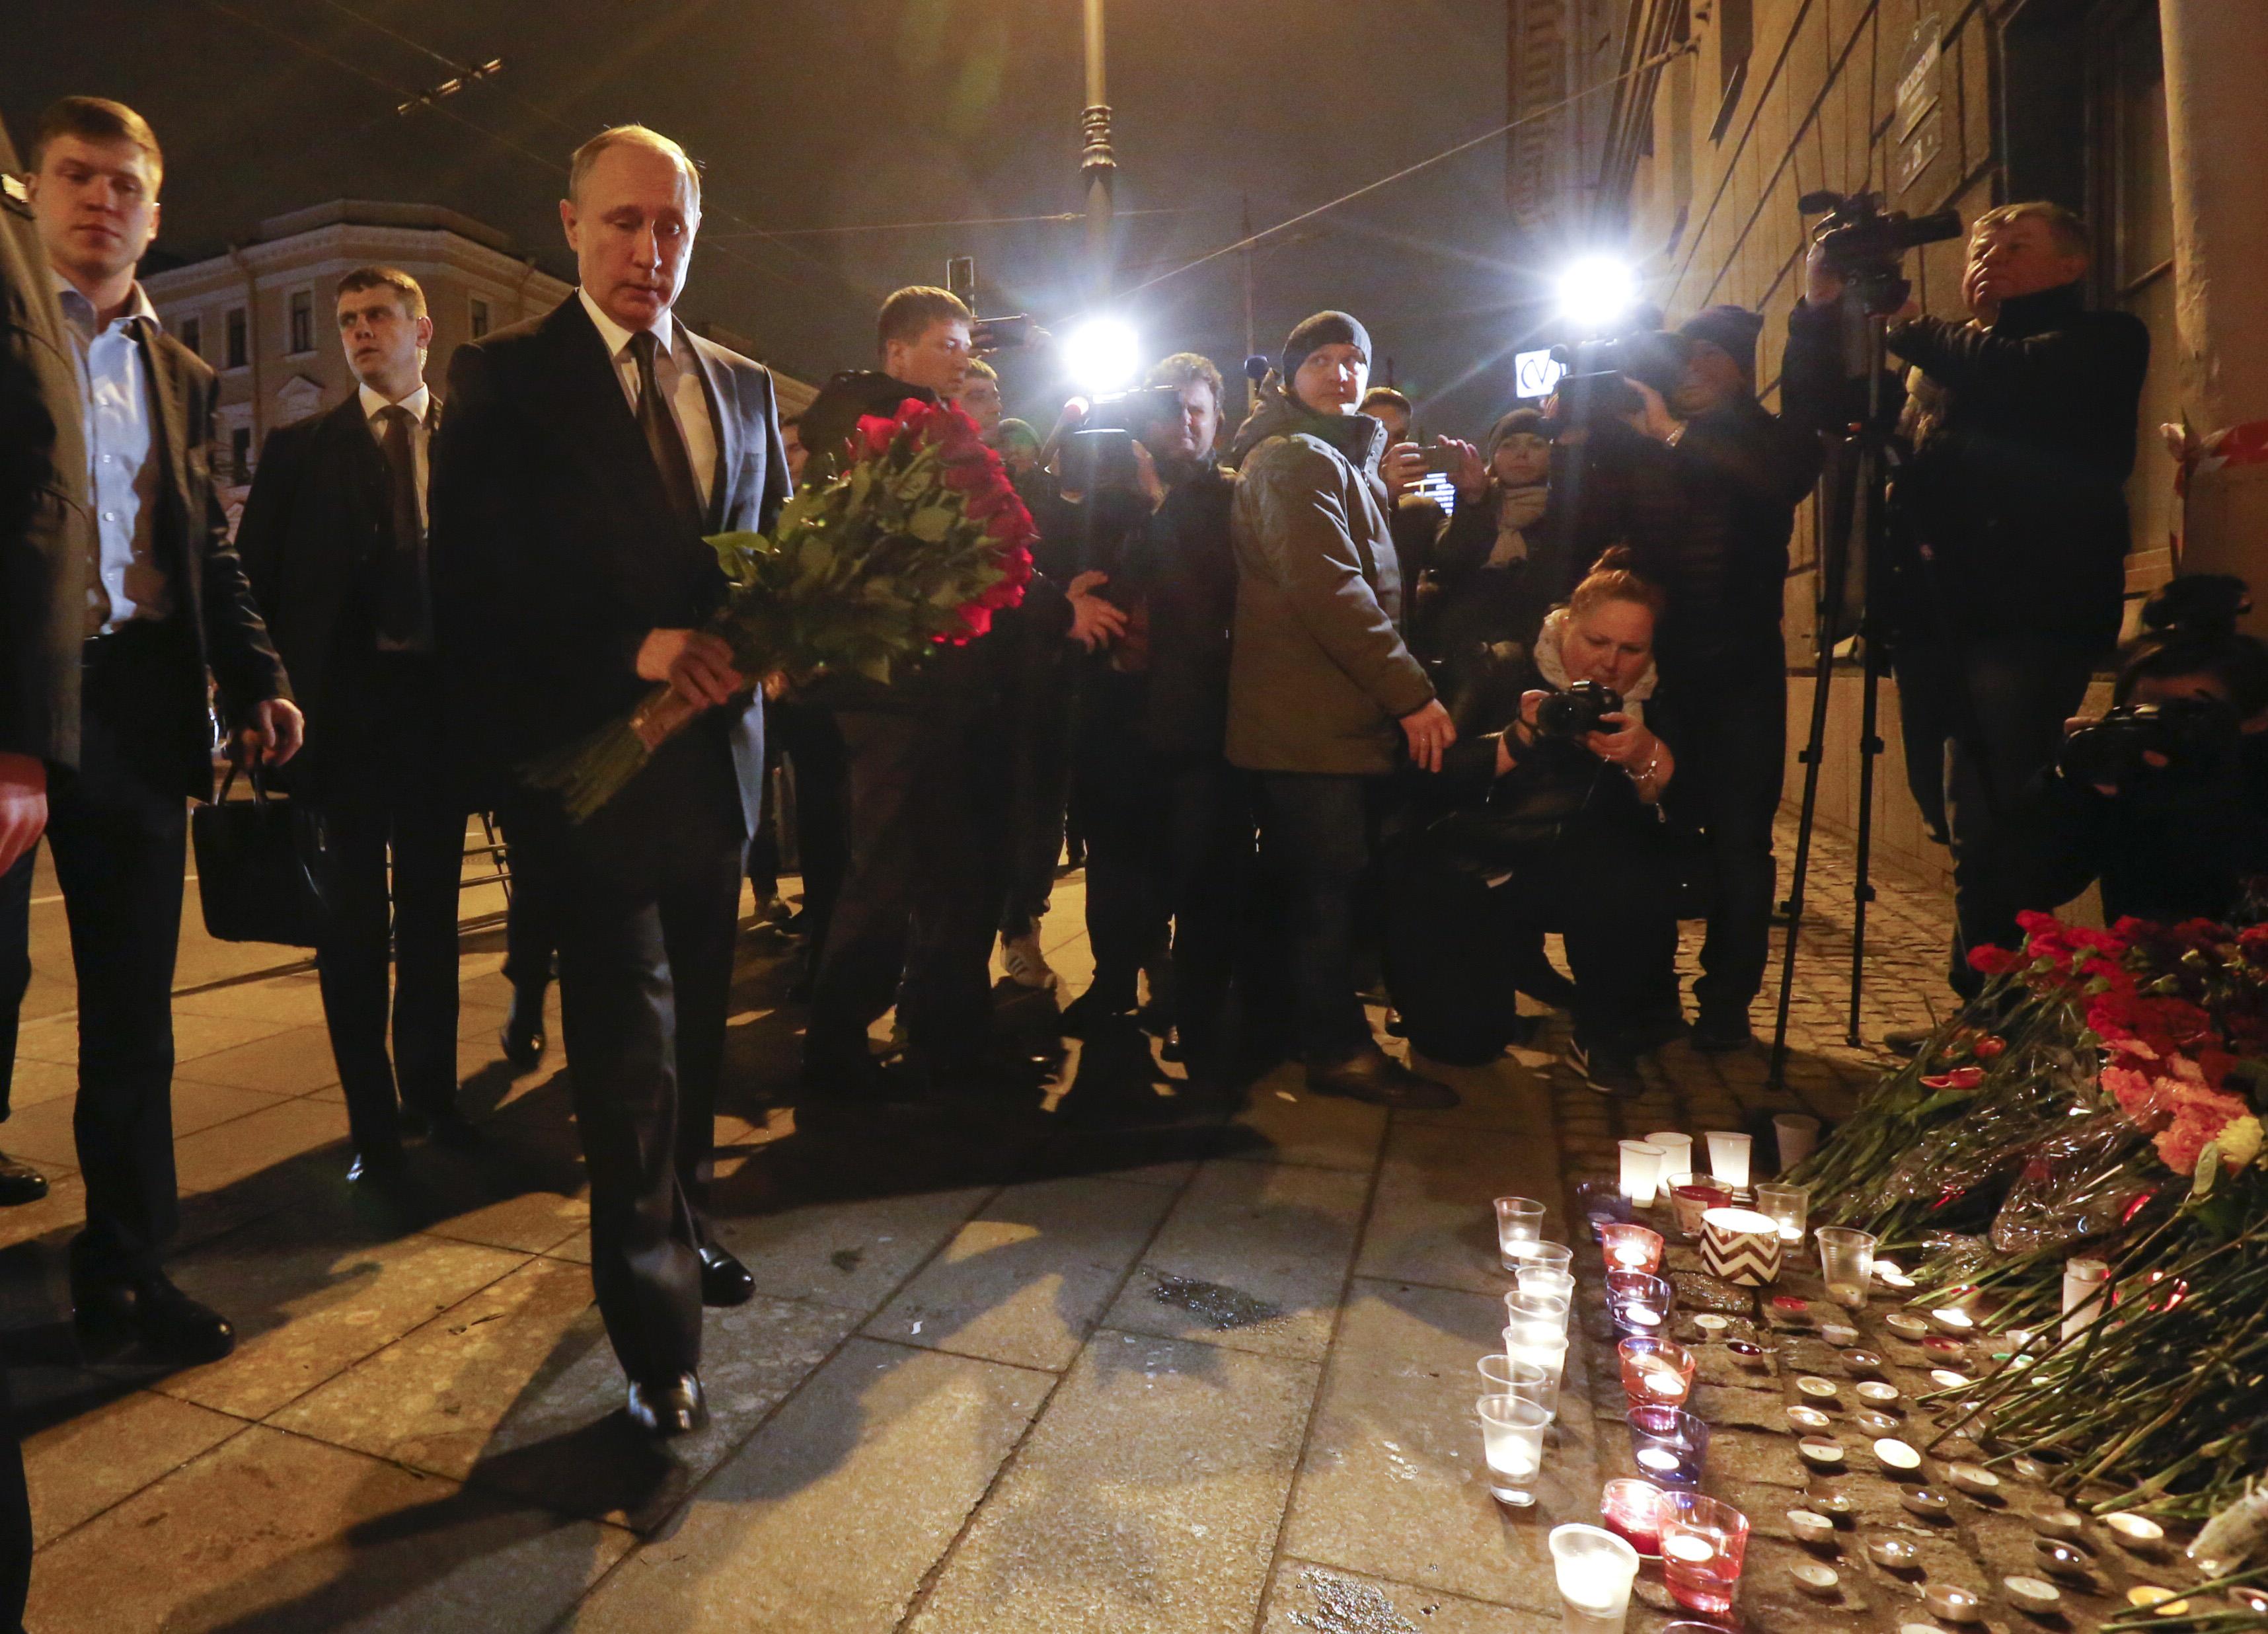 Russian president Vladimir Putin puts flowers down outside Tekhnologicheskiy Institut metro station in St. Petersburg, Russia. REUTERS/Grigory Duko